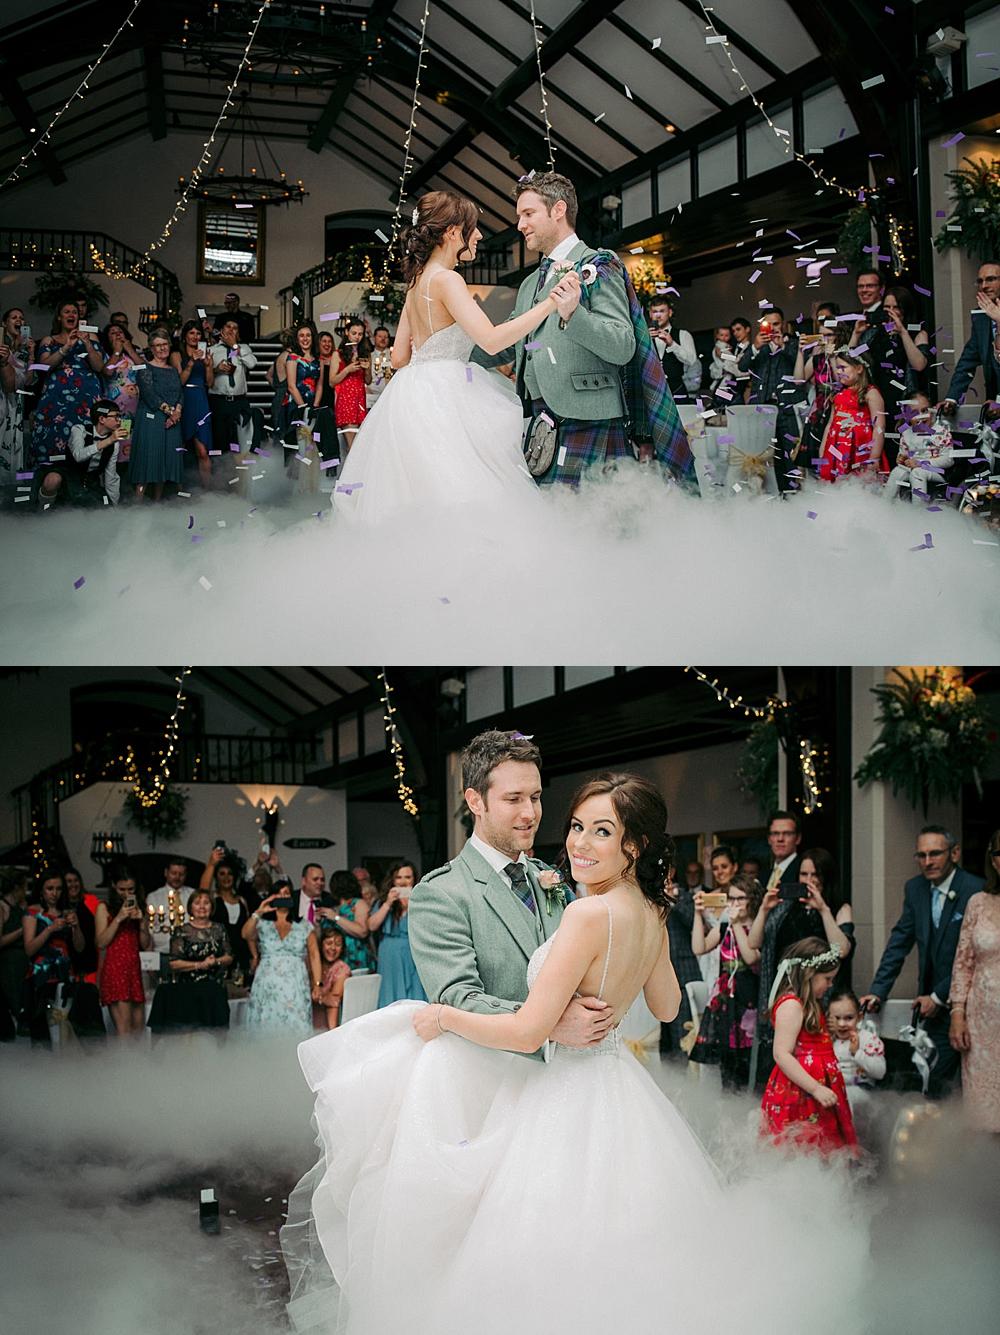 Scottish weddings dancing & fun 0067.jpg